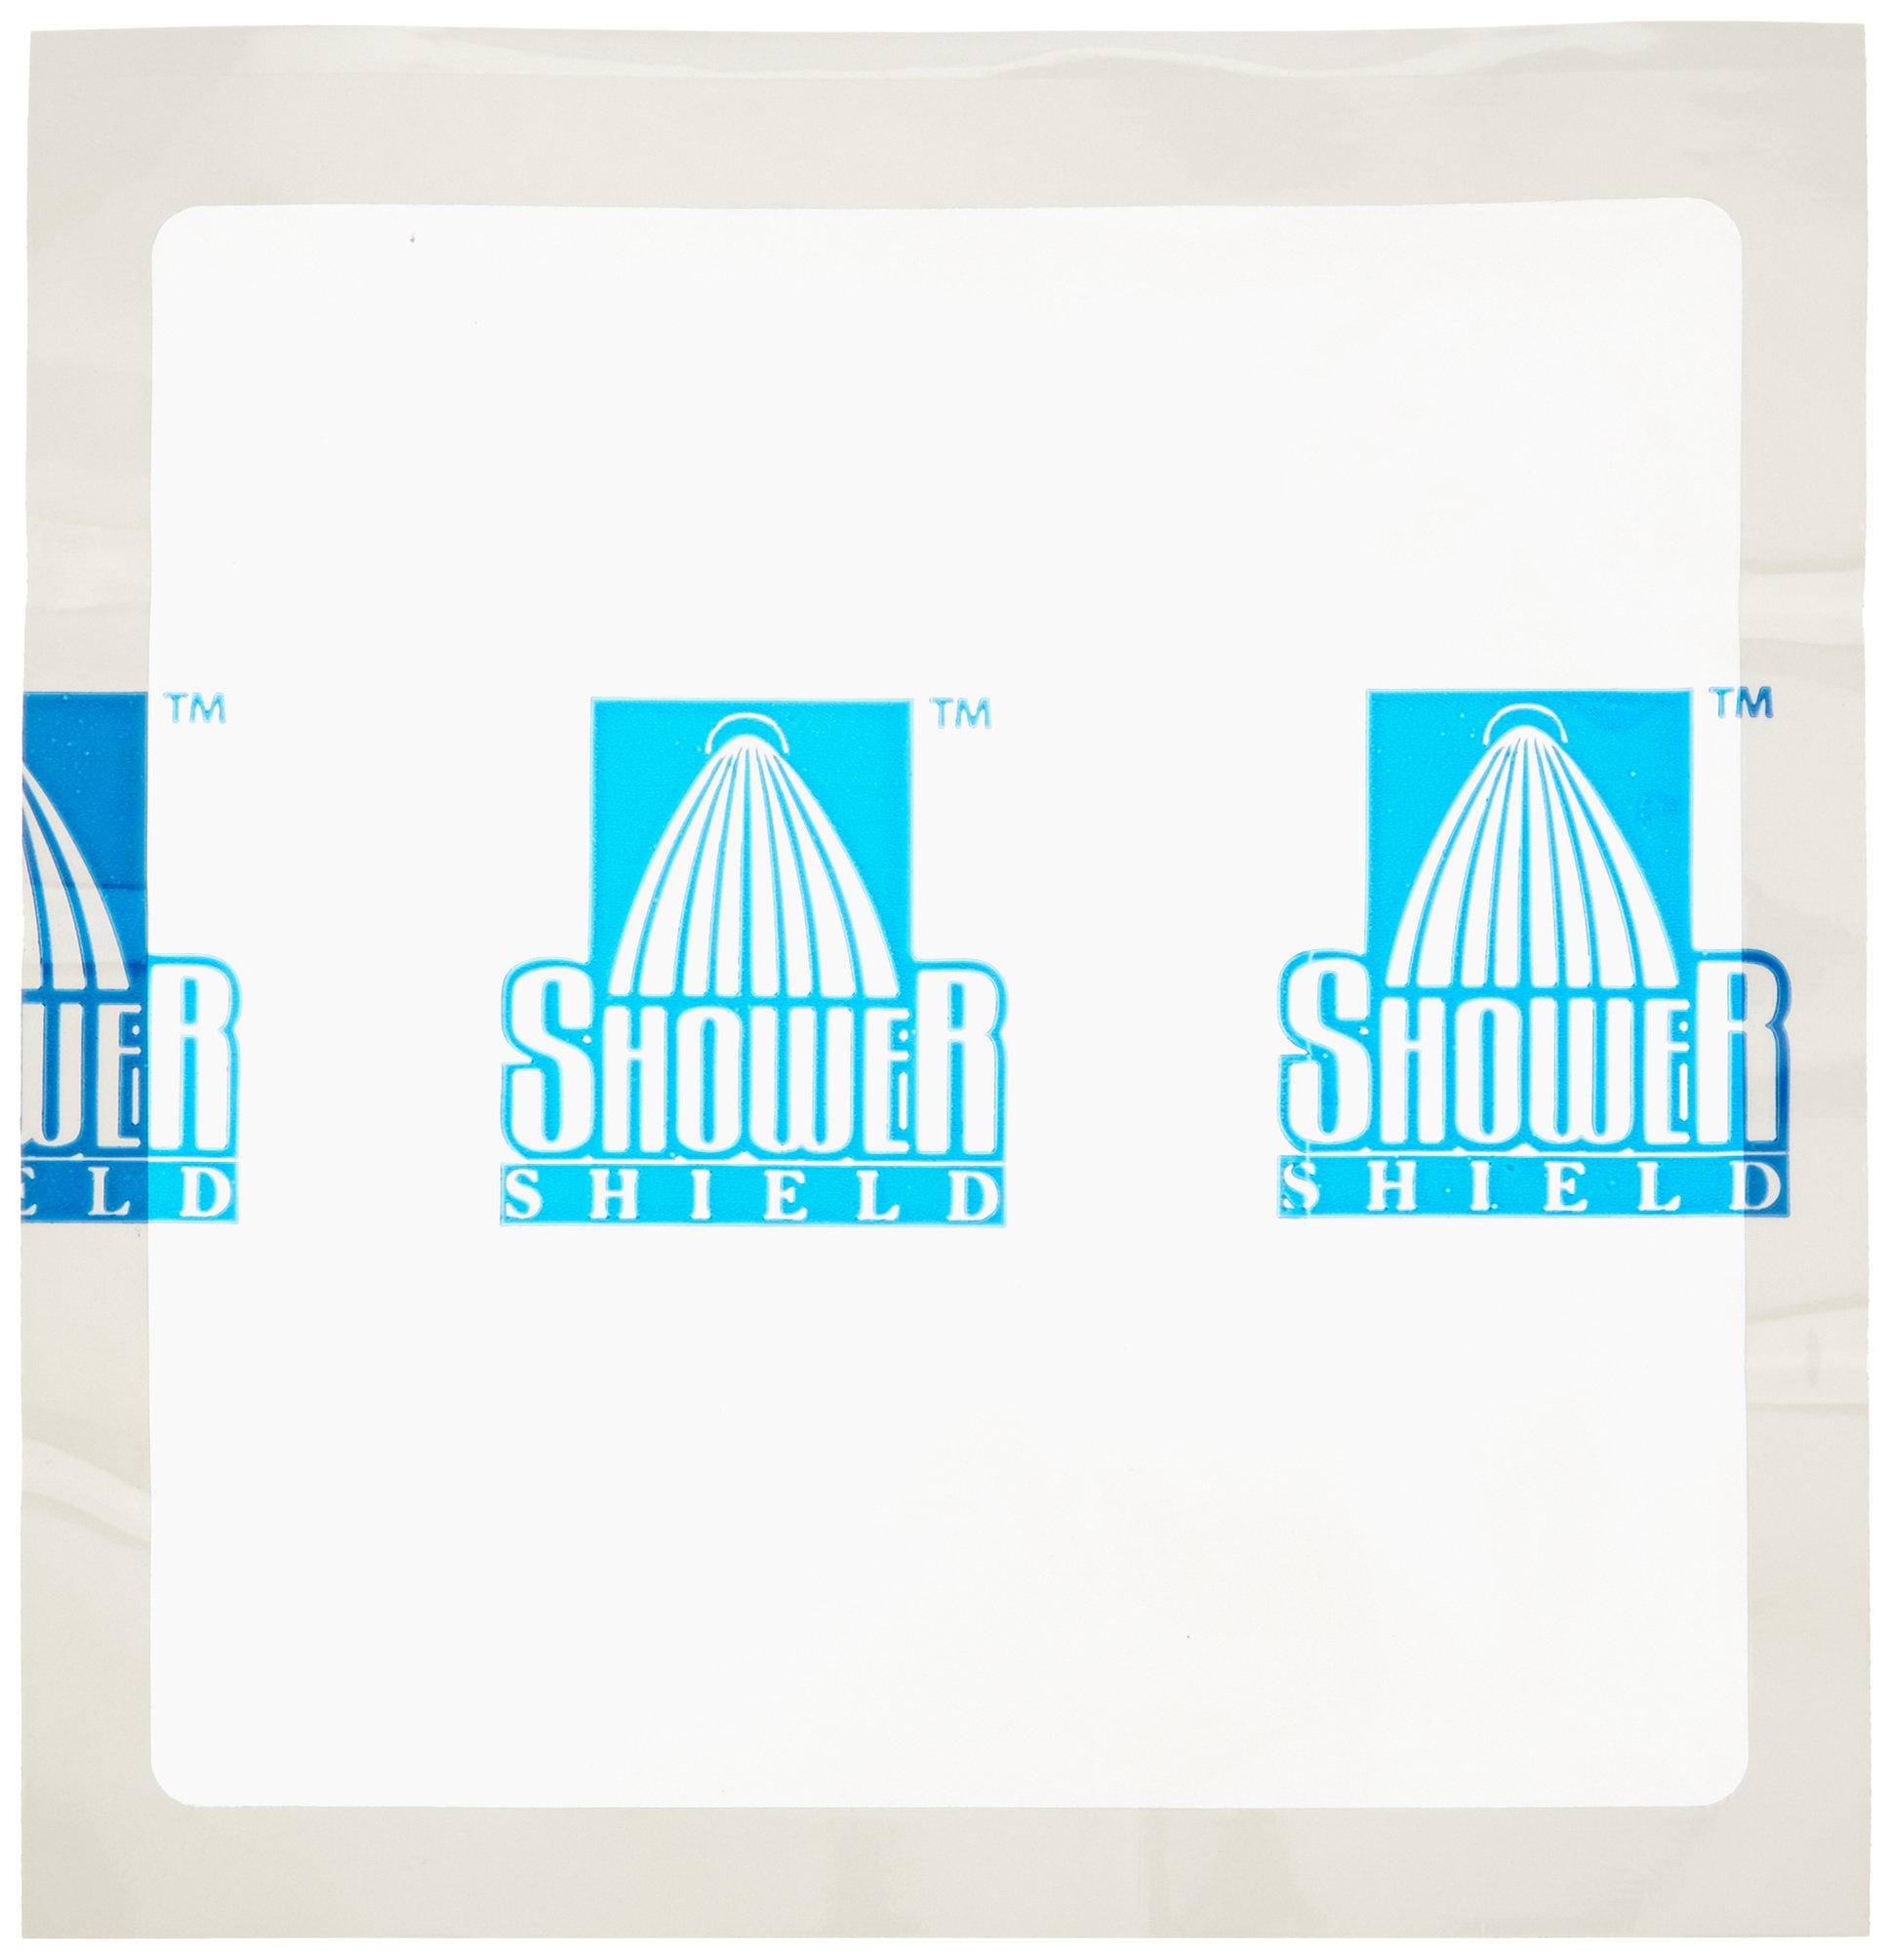 Amazon shower shield 10x12 inch picc line shower cover shower shield 9 x 9 ss99 picc line cover moisture barrier sciox Choice Image